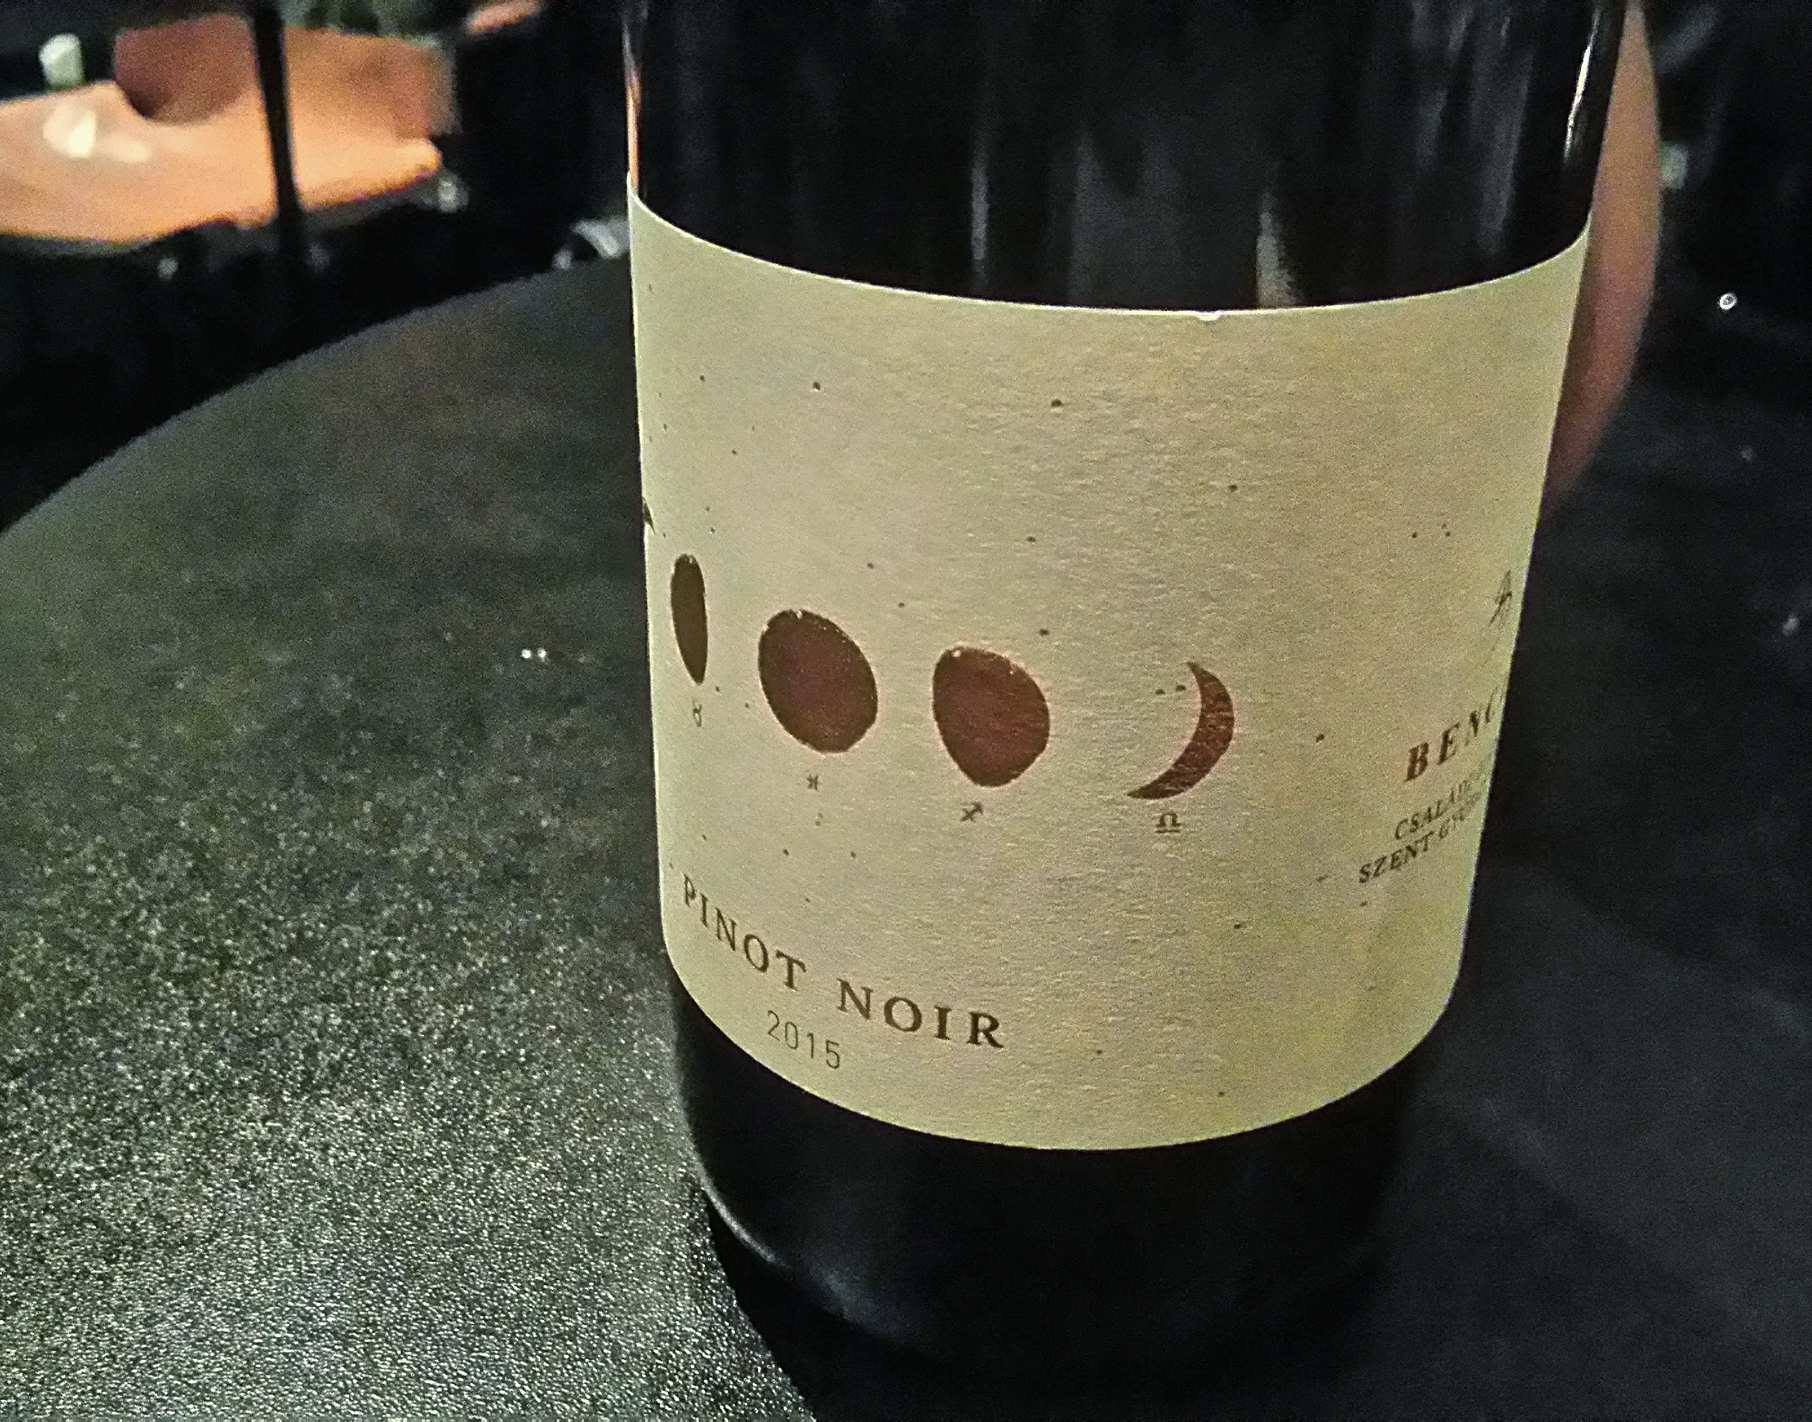 Bencze Pinot